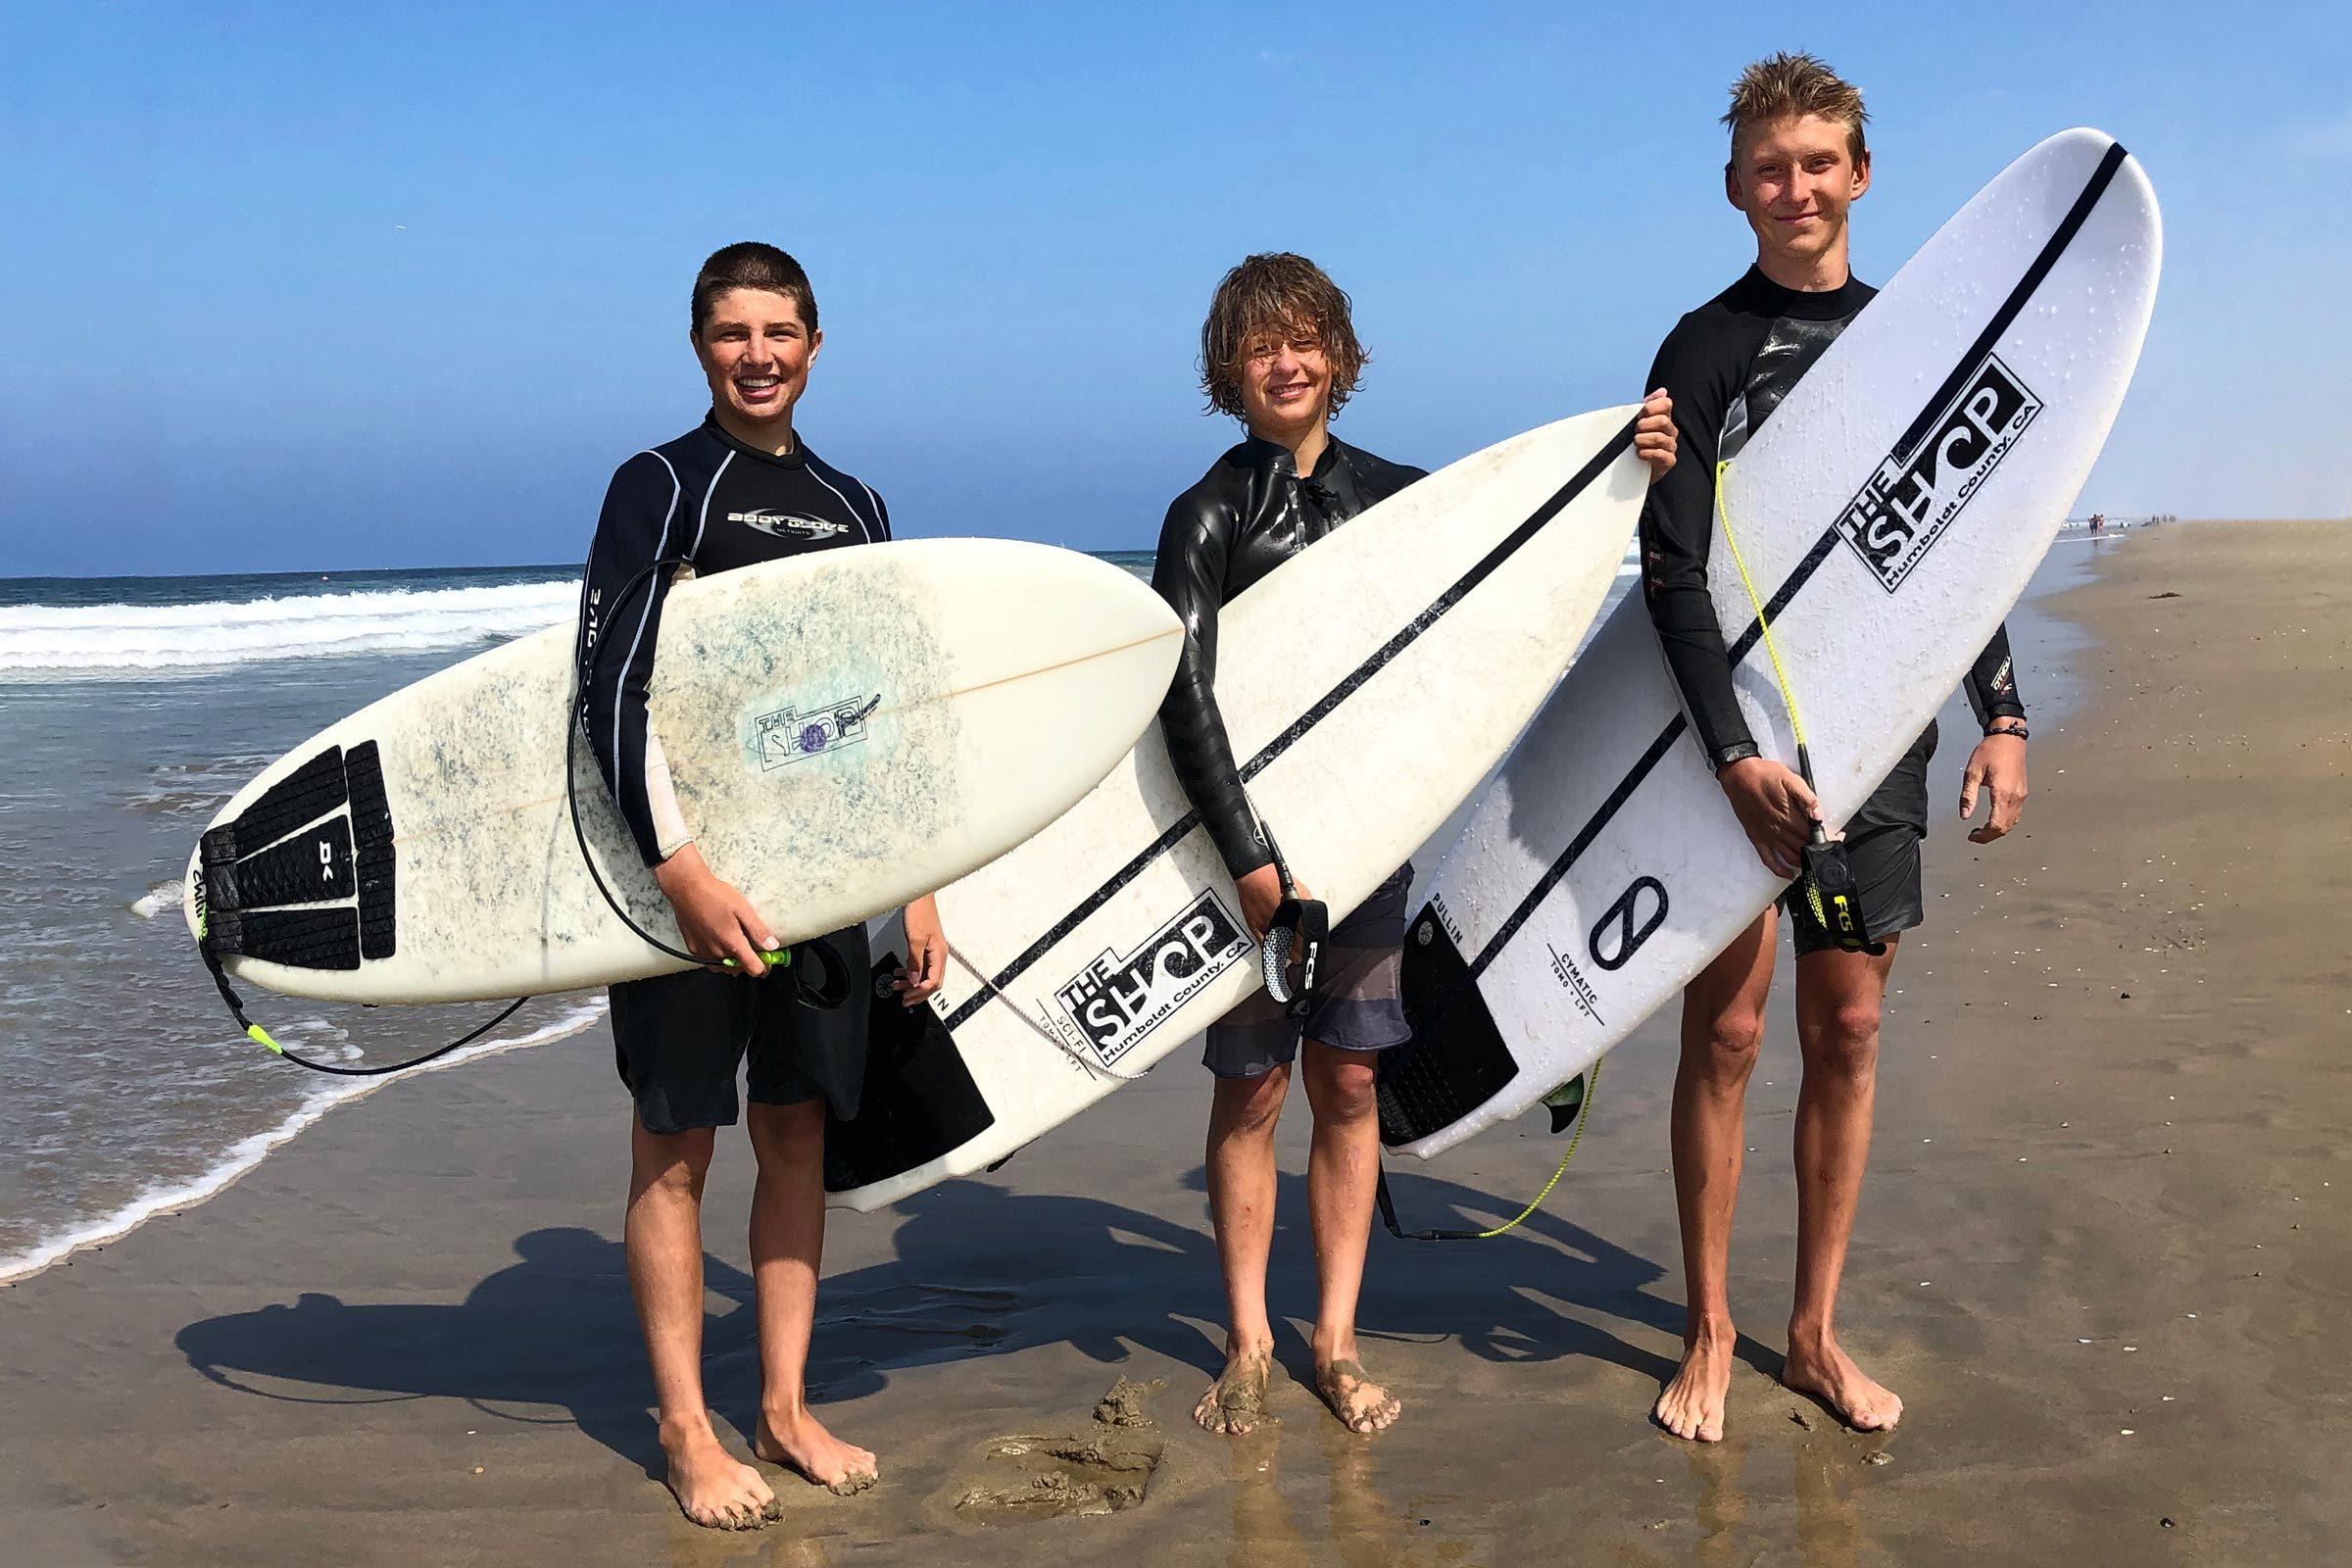 Spenvser Stratton, Taj Ortiz-Beck, and Adrian York on the beach holding surf boards